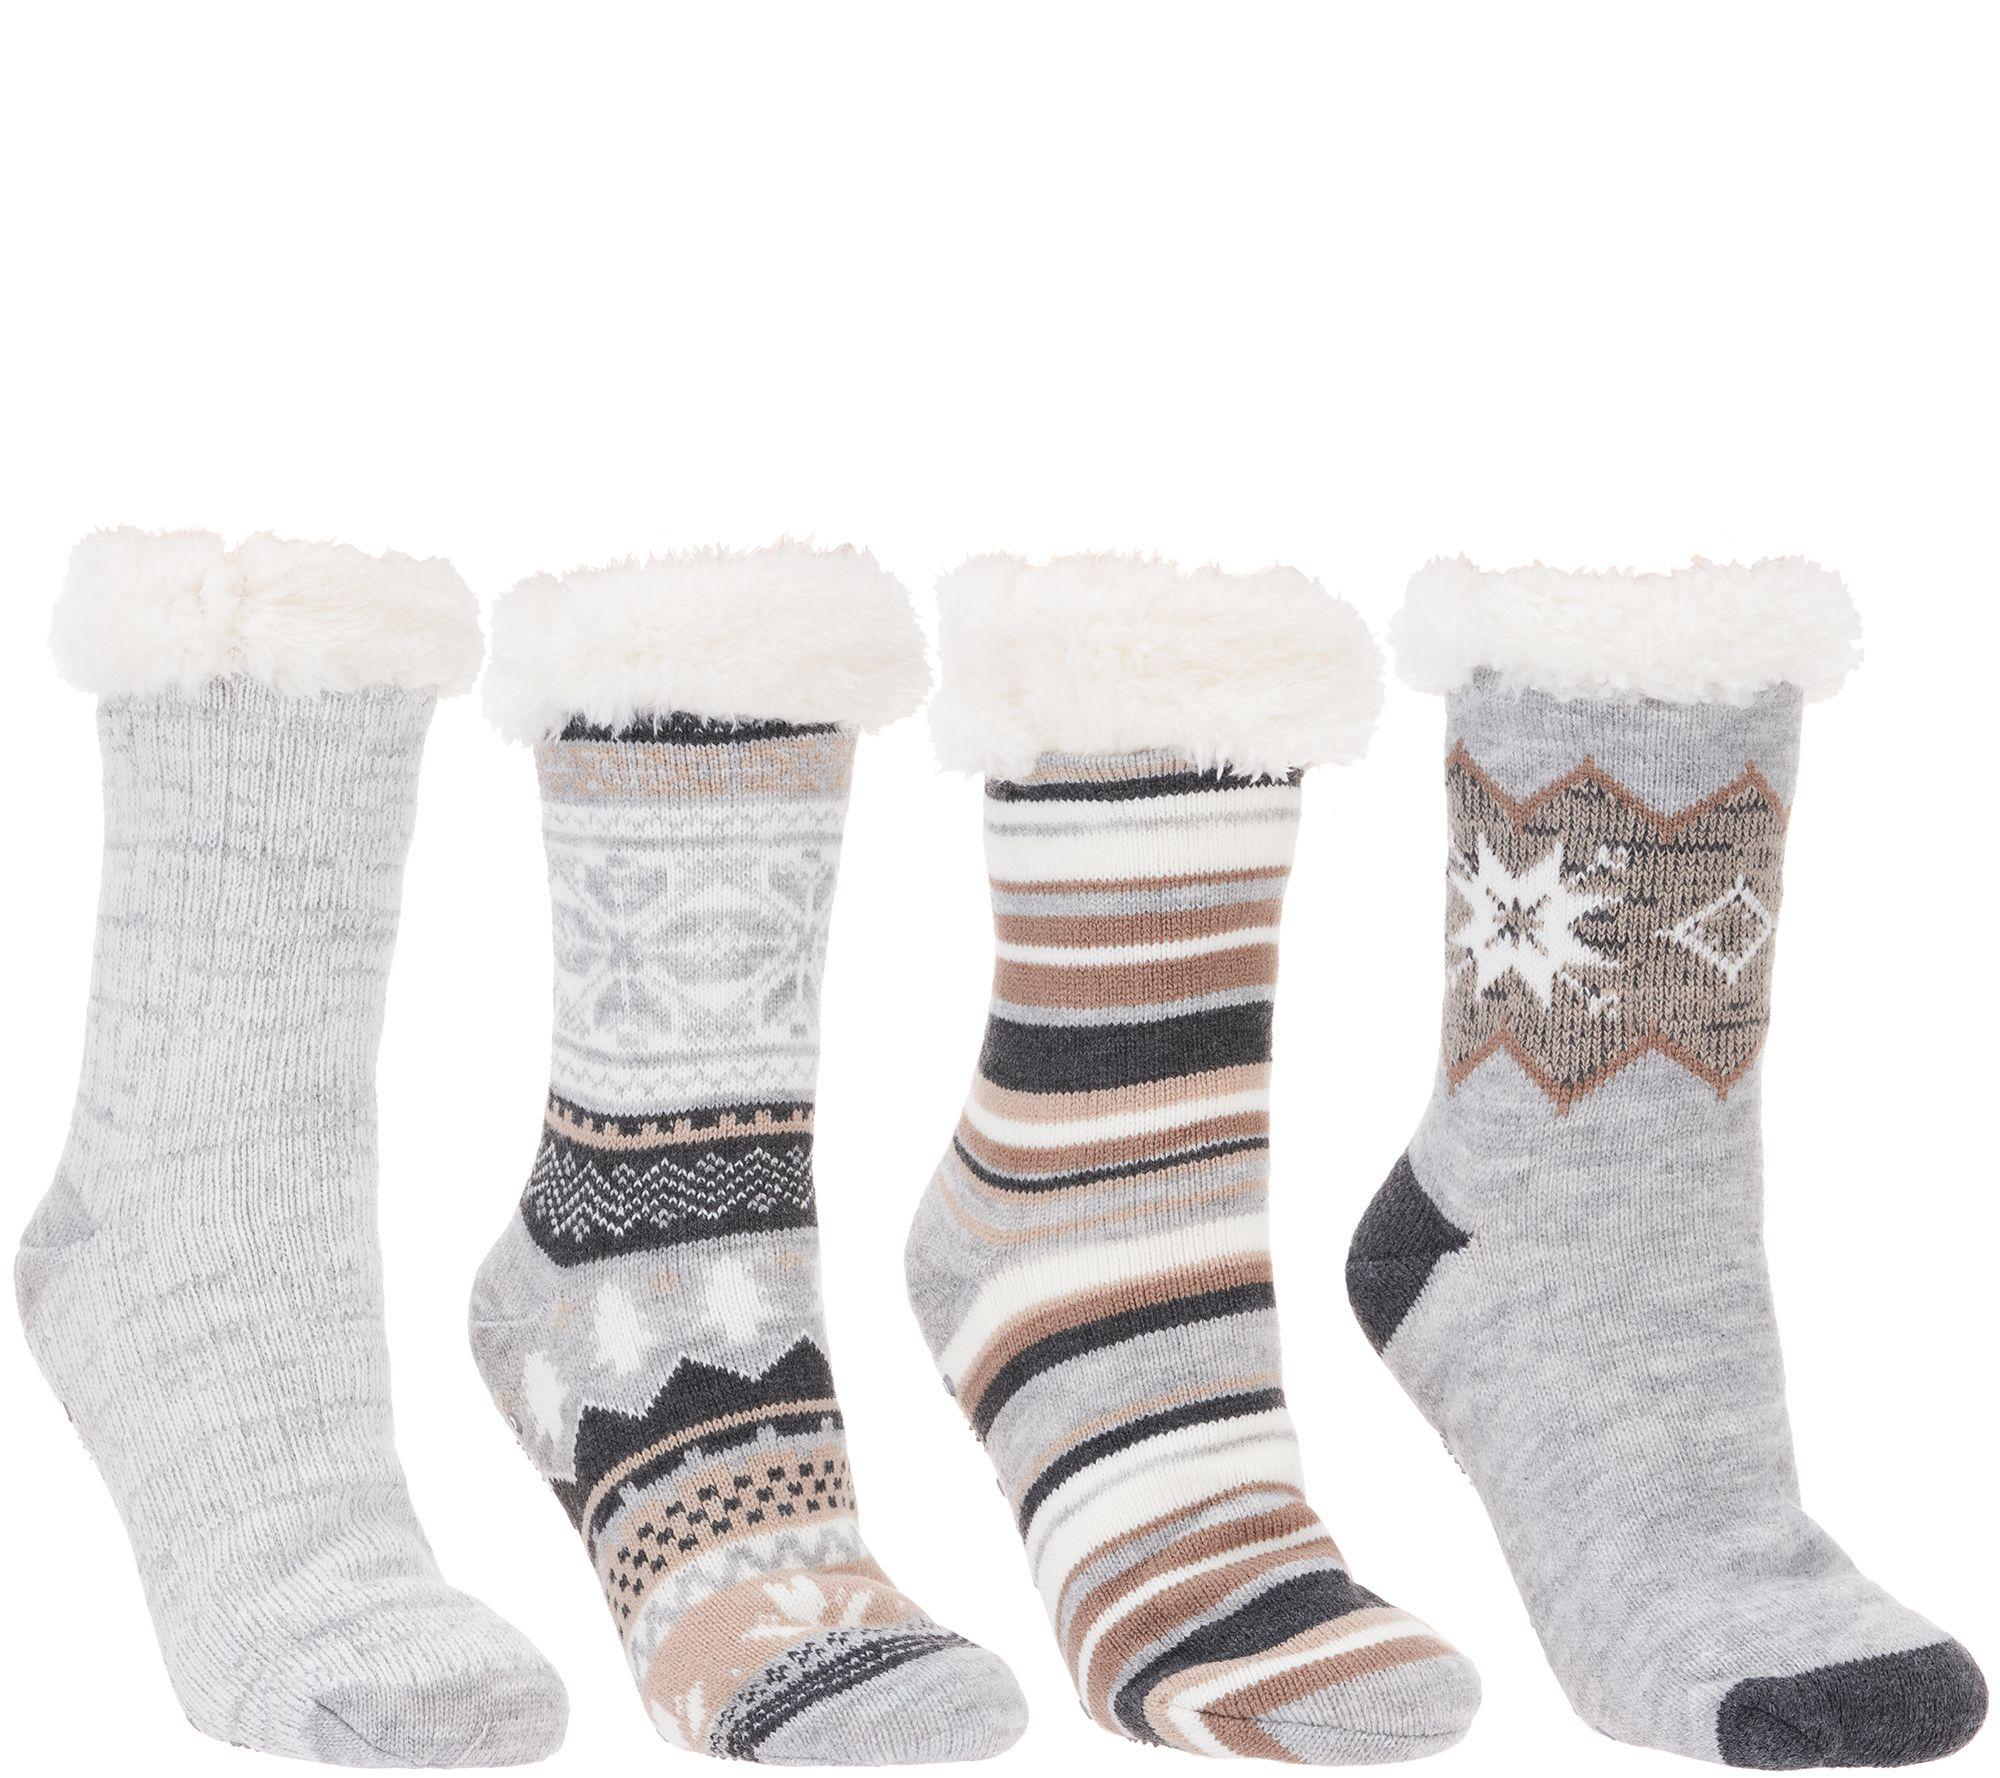 faceb2d4778 MUK LUKS Jojoba Infused Faux Shearling Cabin Socks Set of 4 Pairs - Page 1  — QVC.com